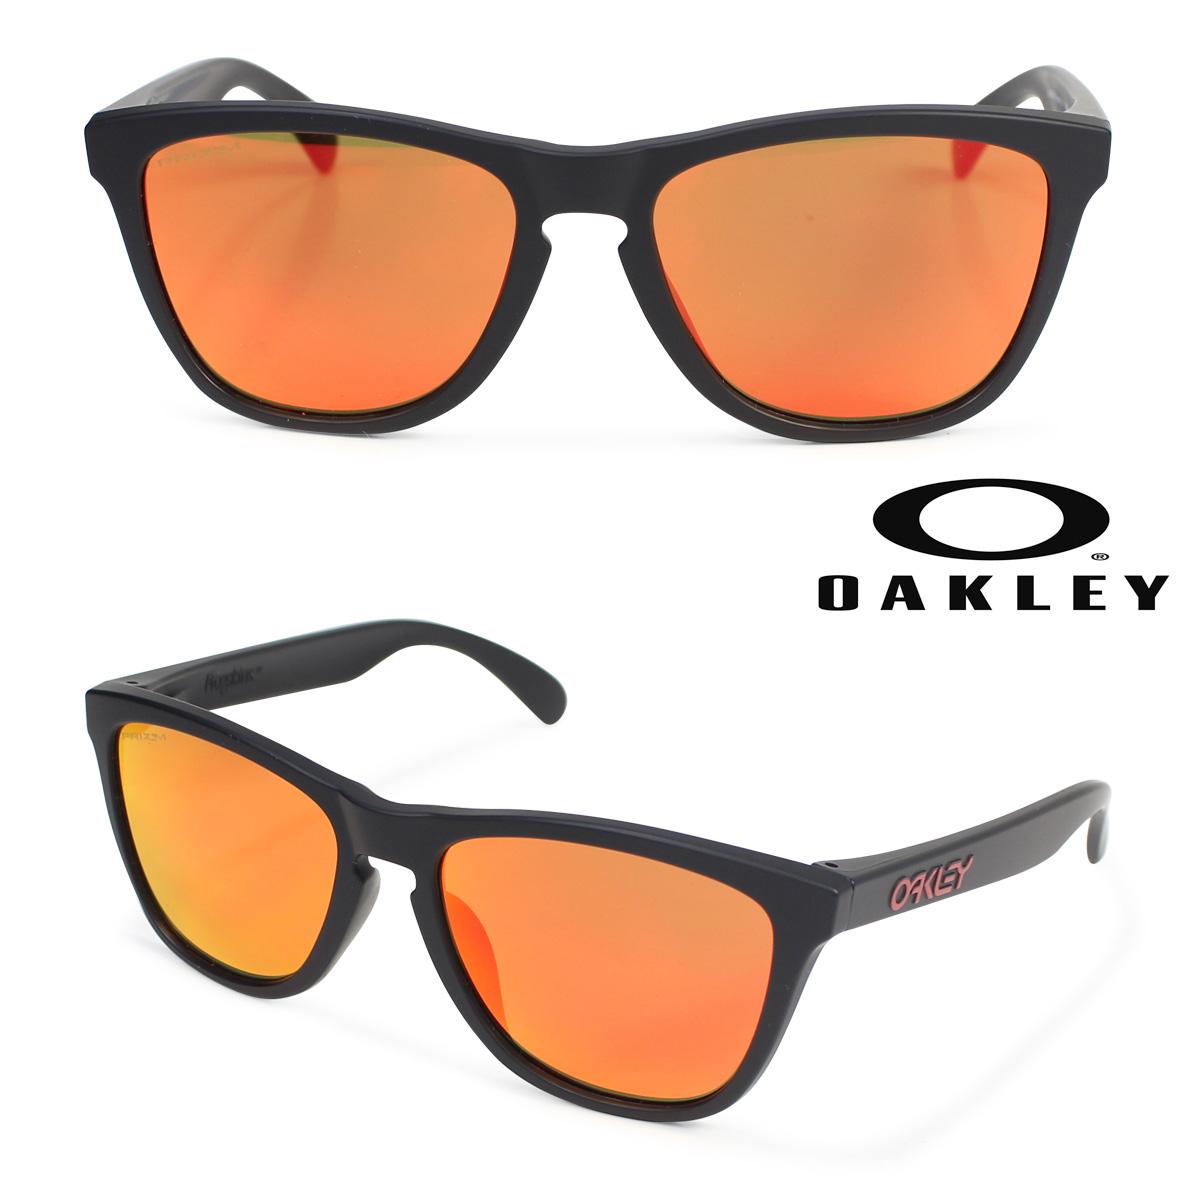 Oakley サングラス アジアンフィット オークリー Frogskins フロッグスキン ASIA FIT OO9245-6354 メンズ レディース [177] 【決算セール 返品不可】